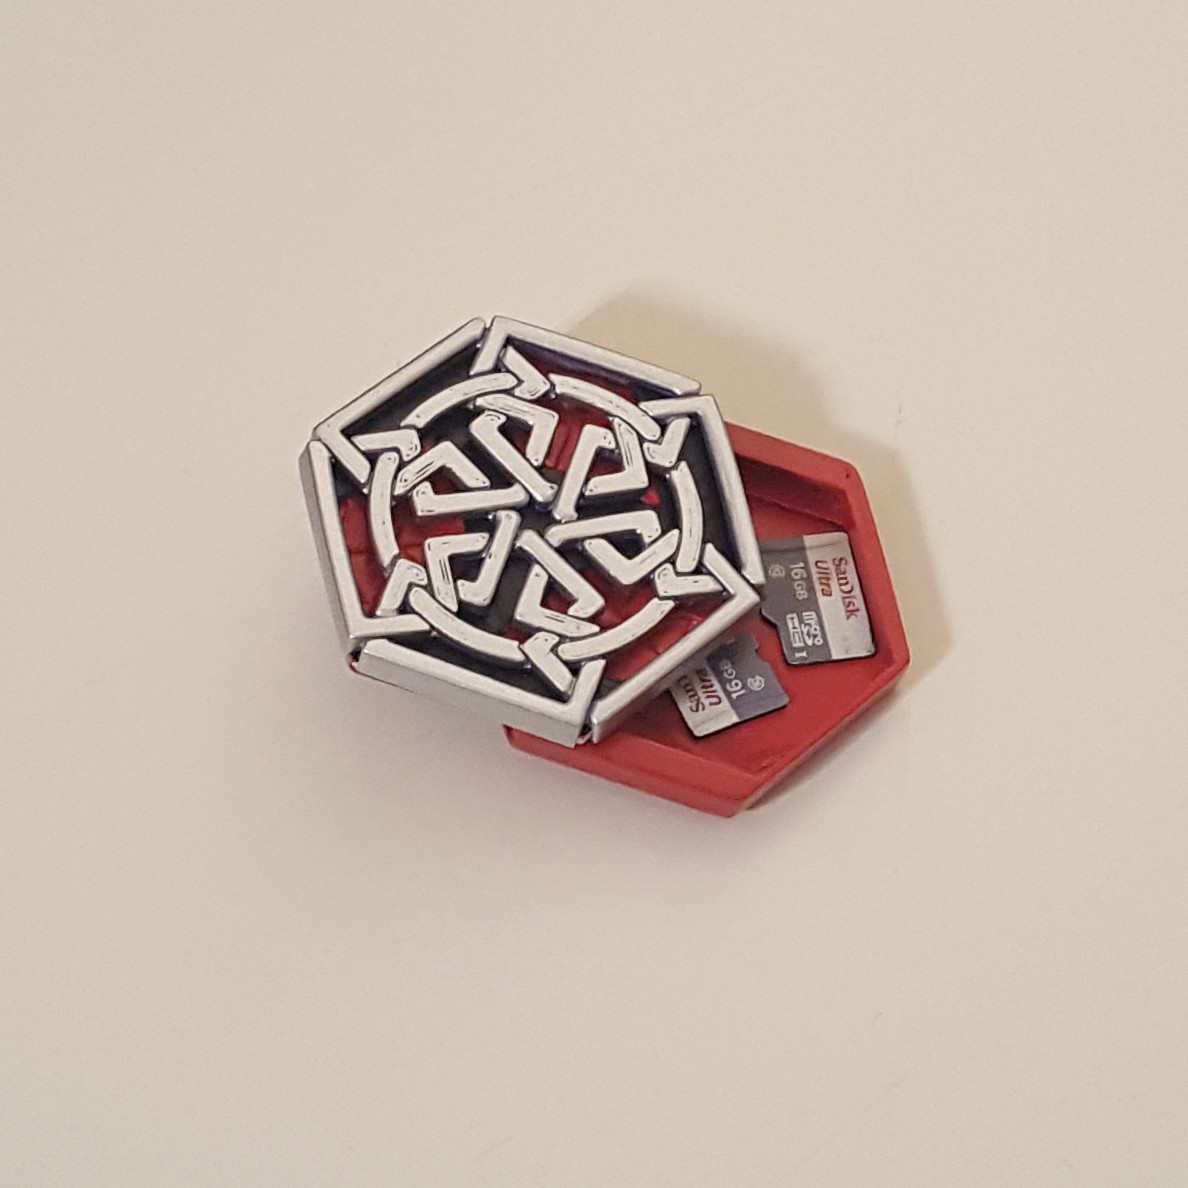 medallion with SD card2.jpg Download free STL file Secret geometry medallion • 3D printable model, Job